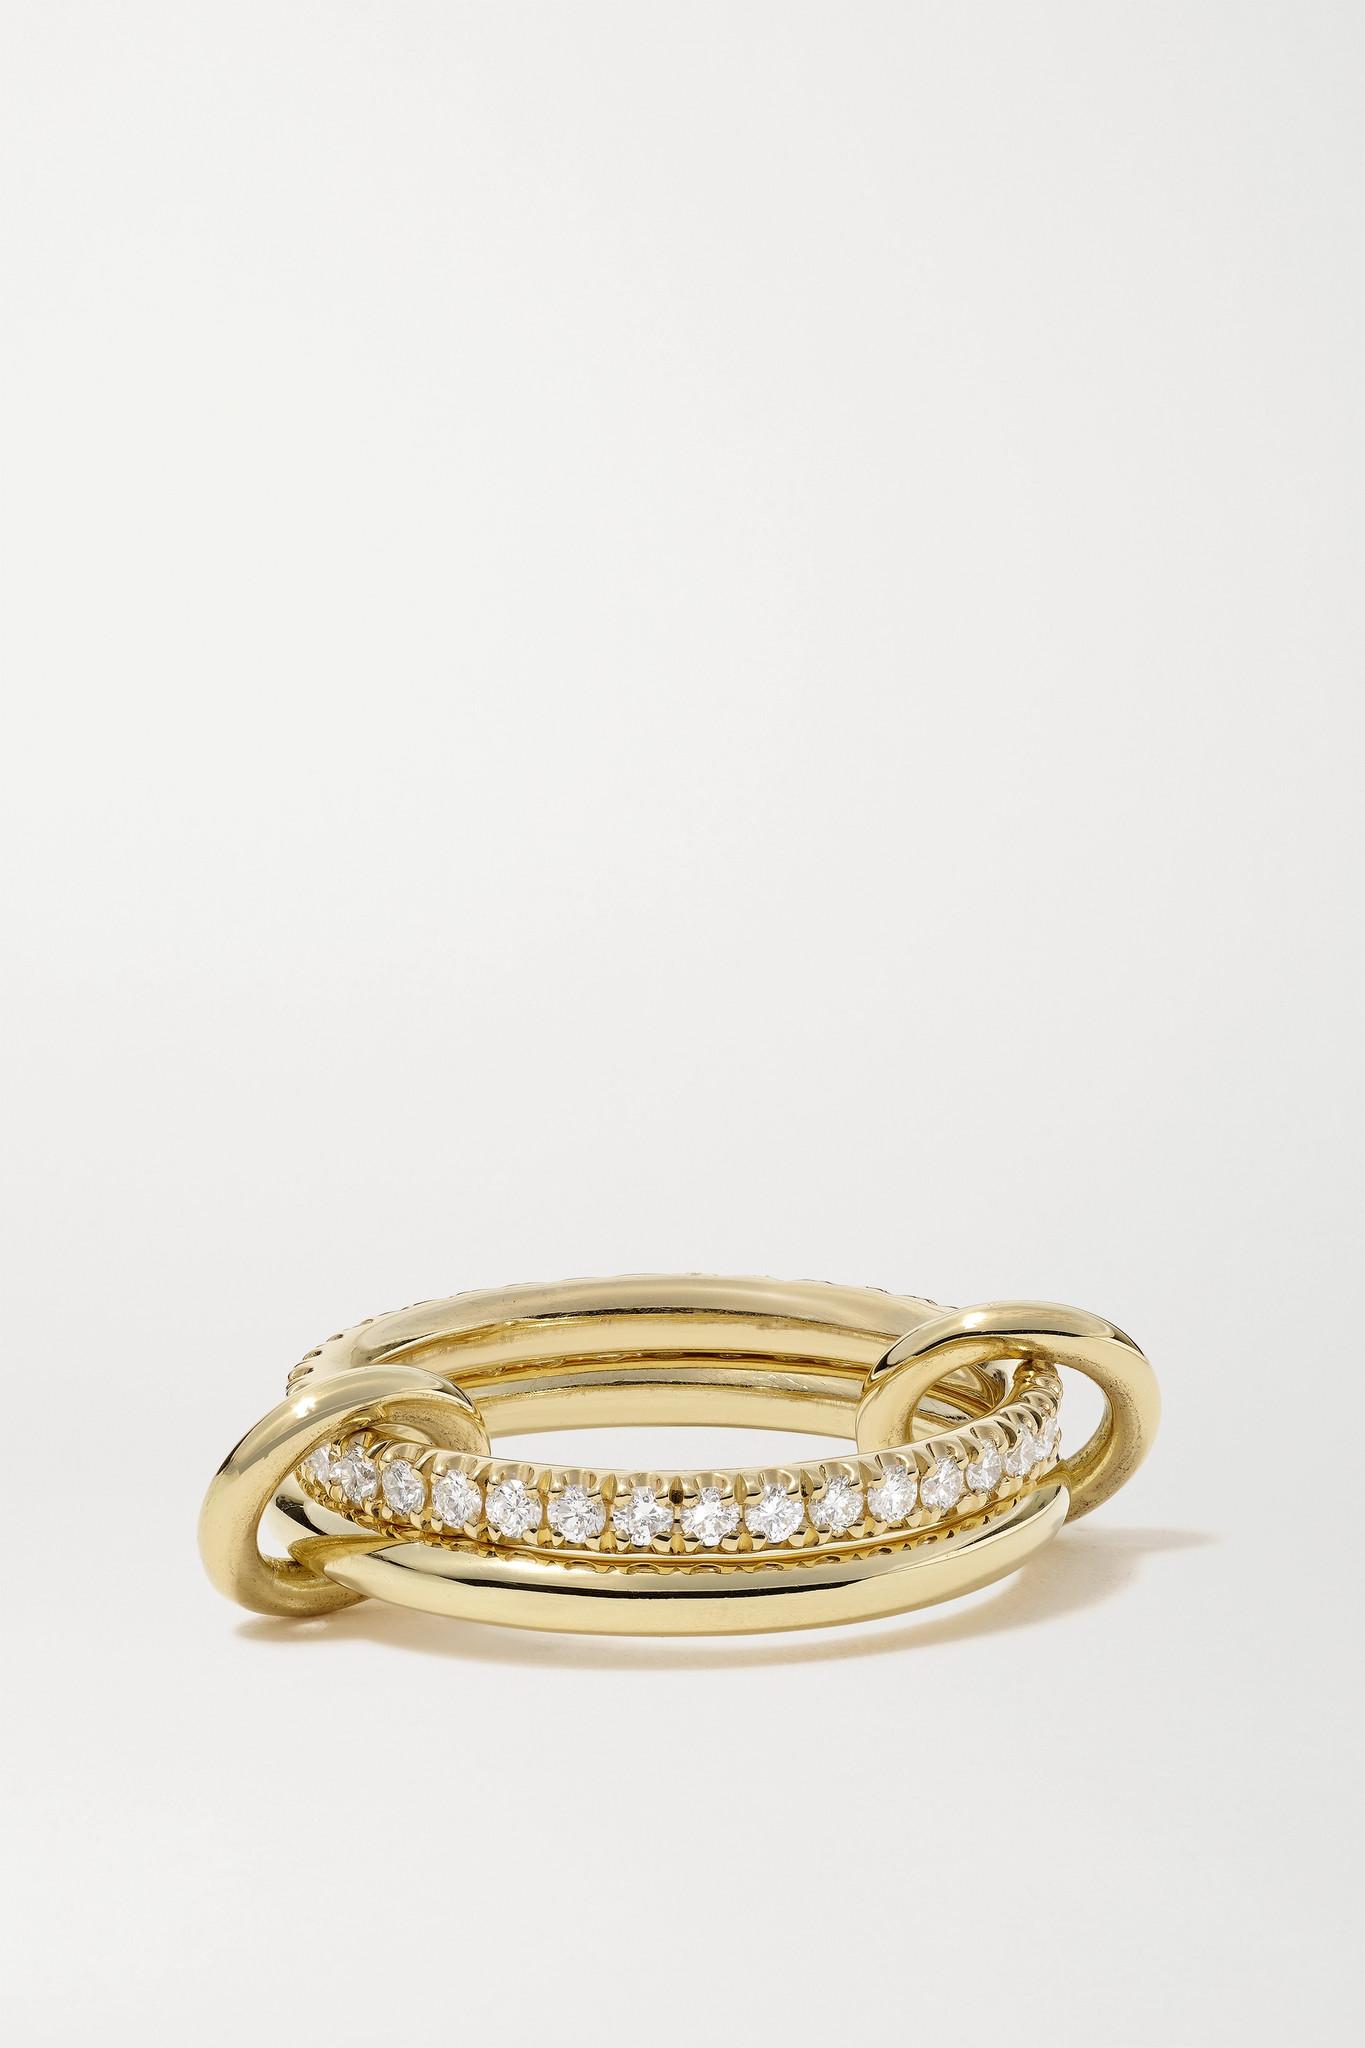 SPINELLI KILCOLLIN - Ceres Deux Set Of Two 18-karat Gold Diamond Rings - 5